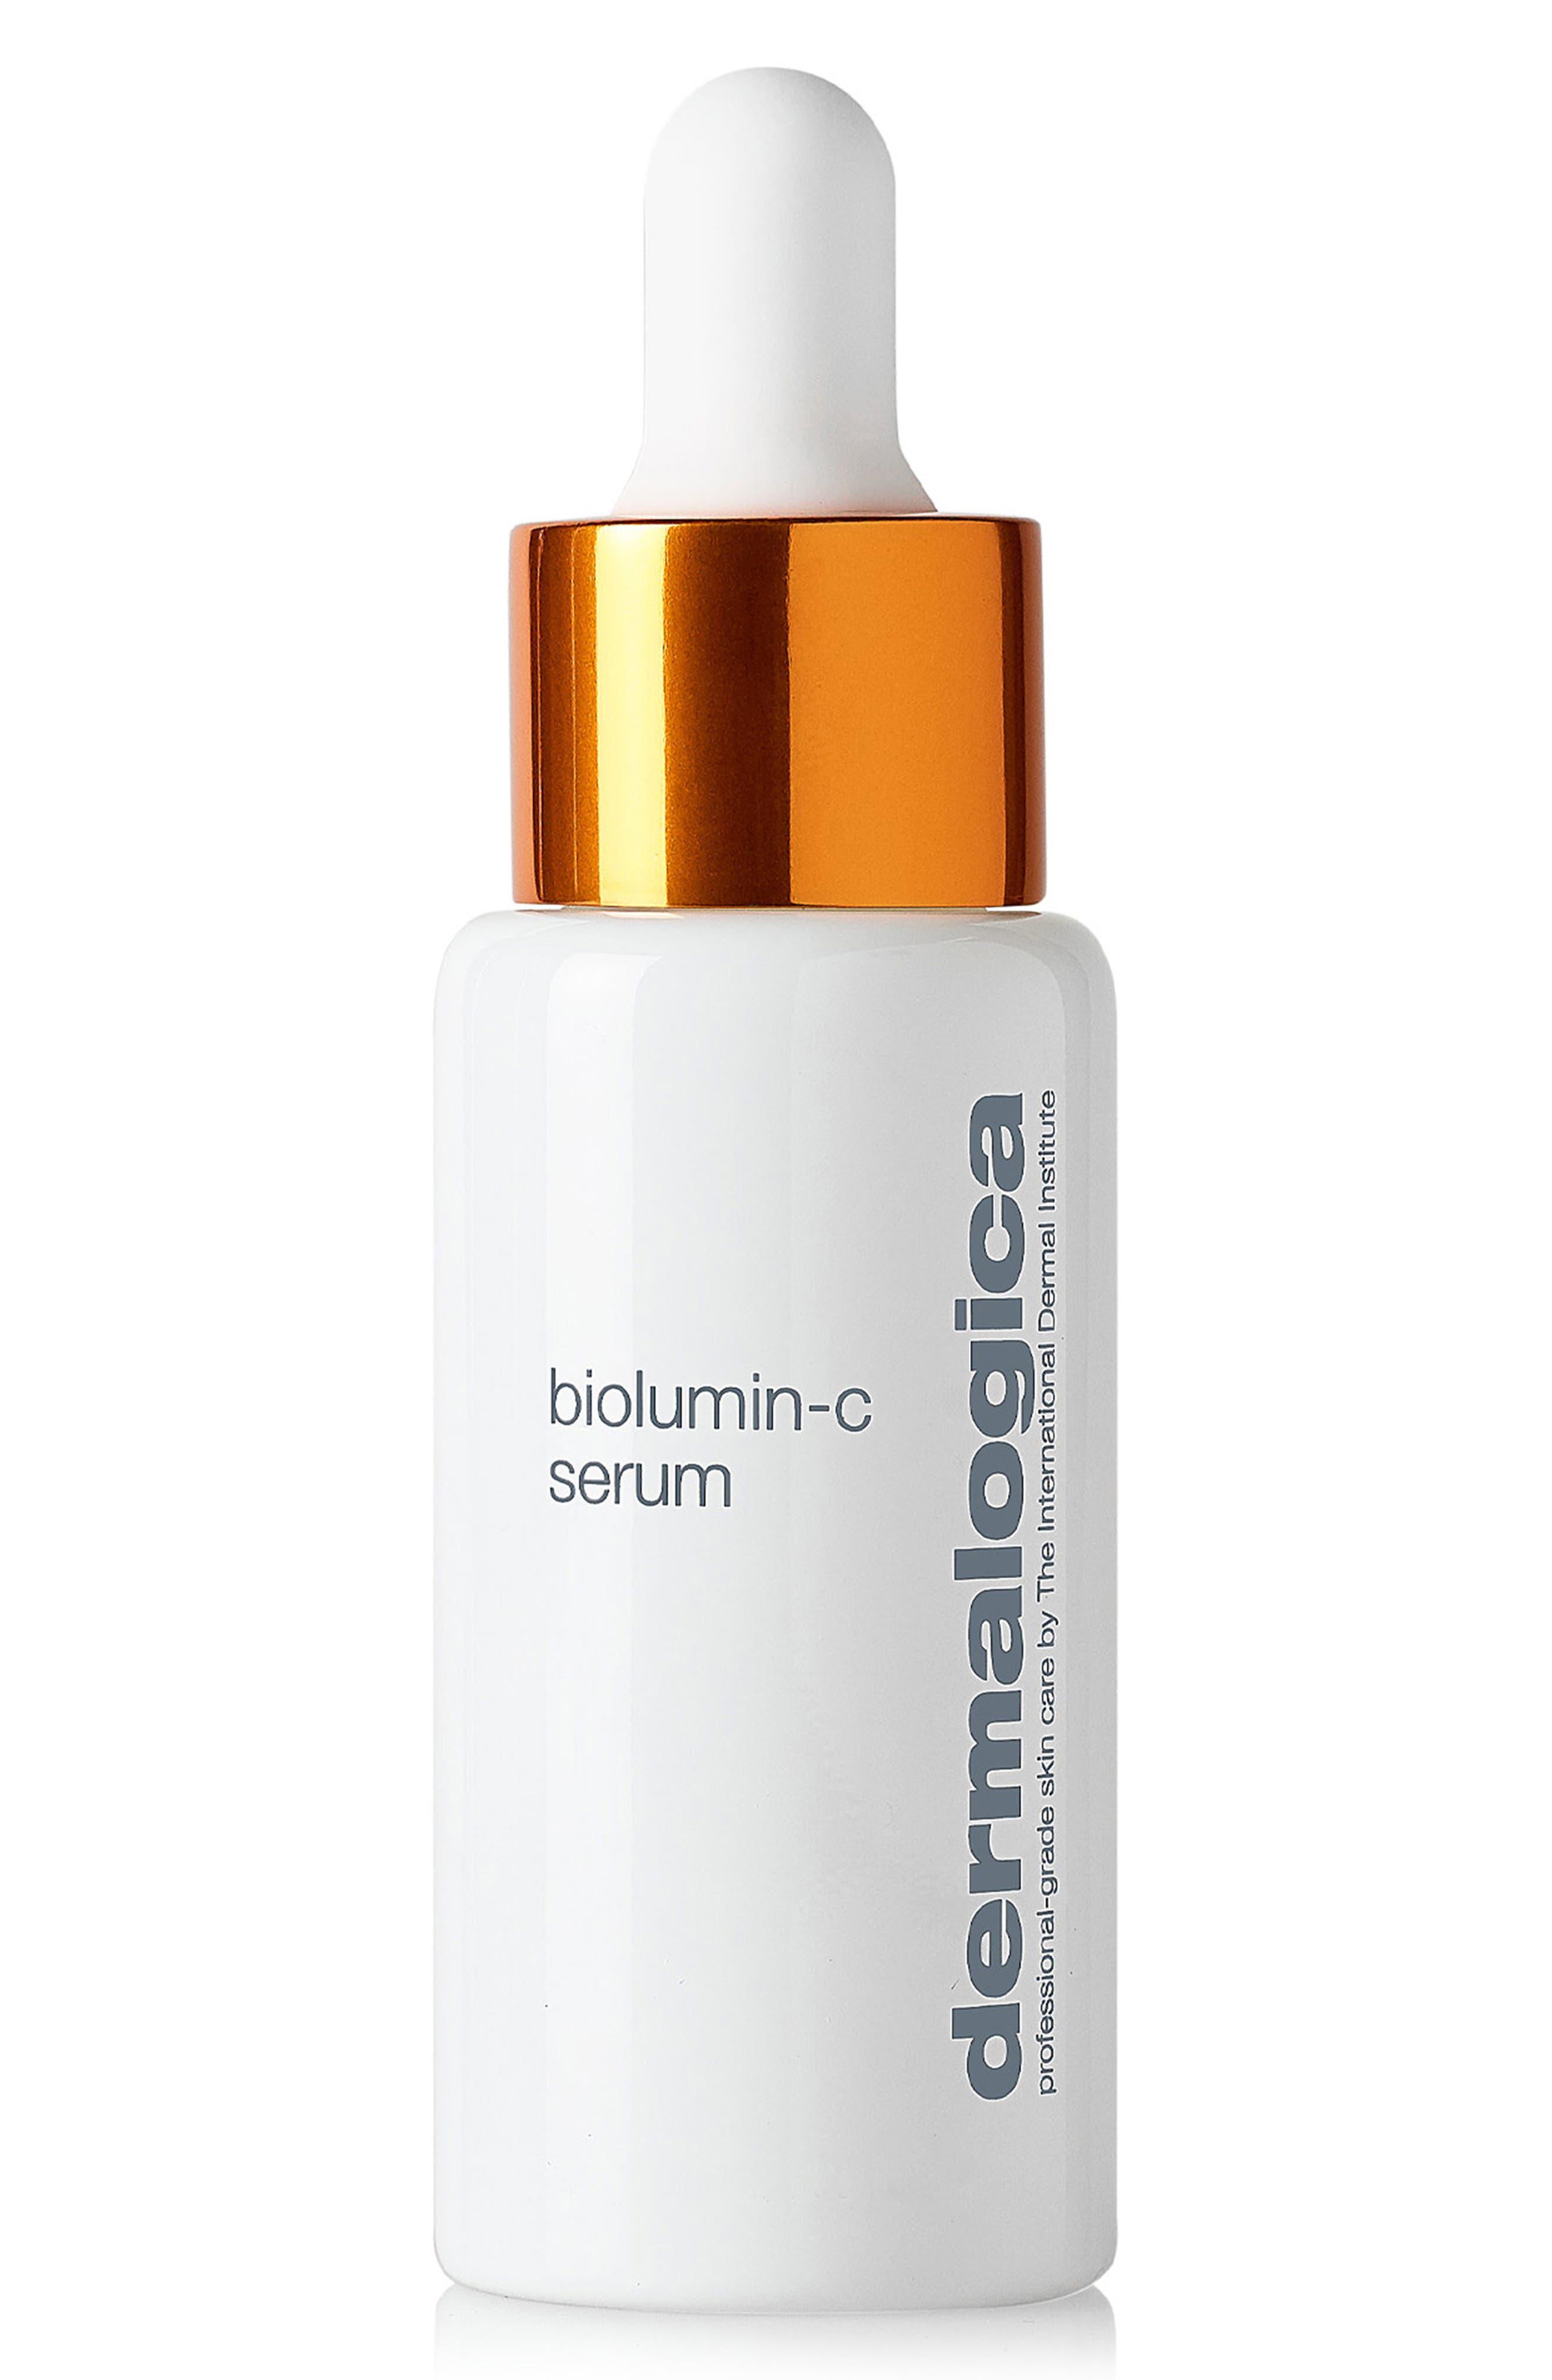 BioLumin-C Vitamin C Serum | Nordstrom